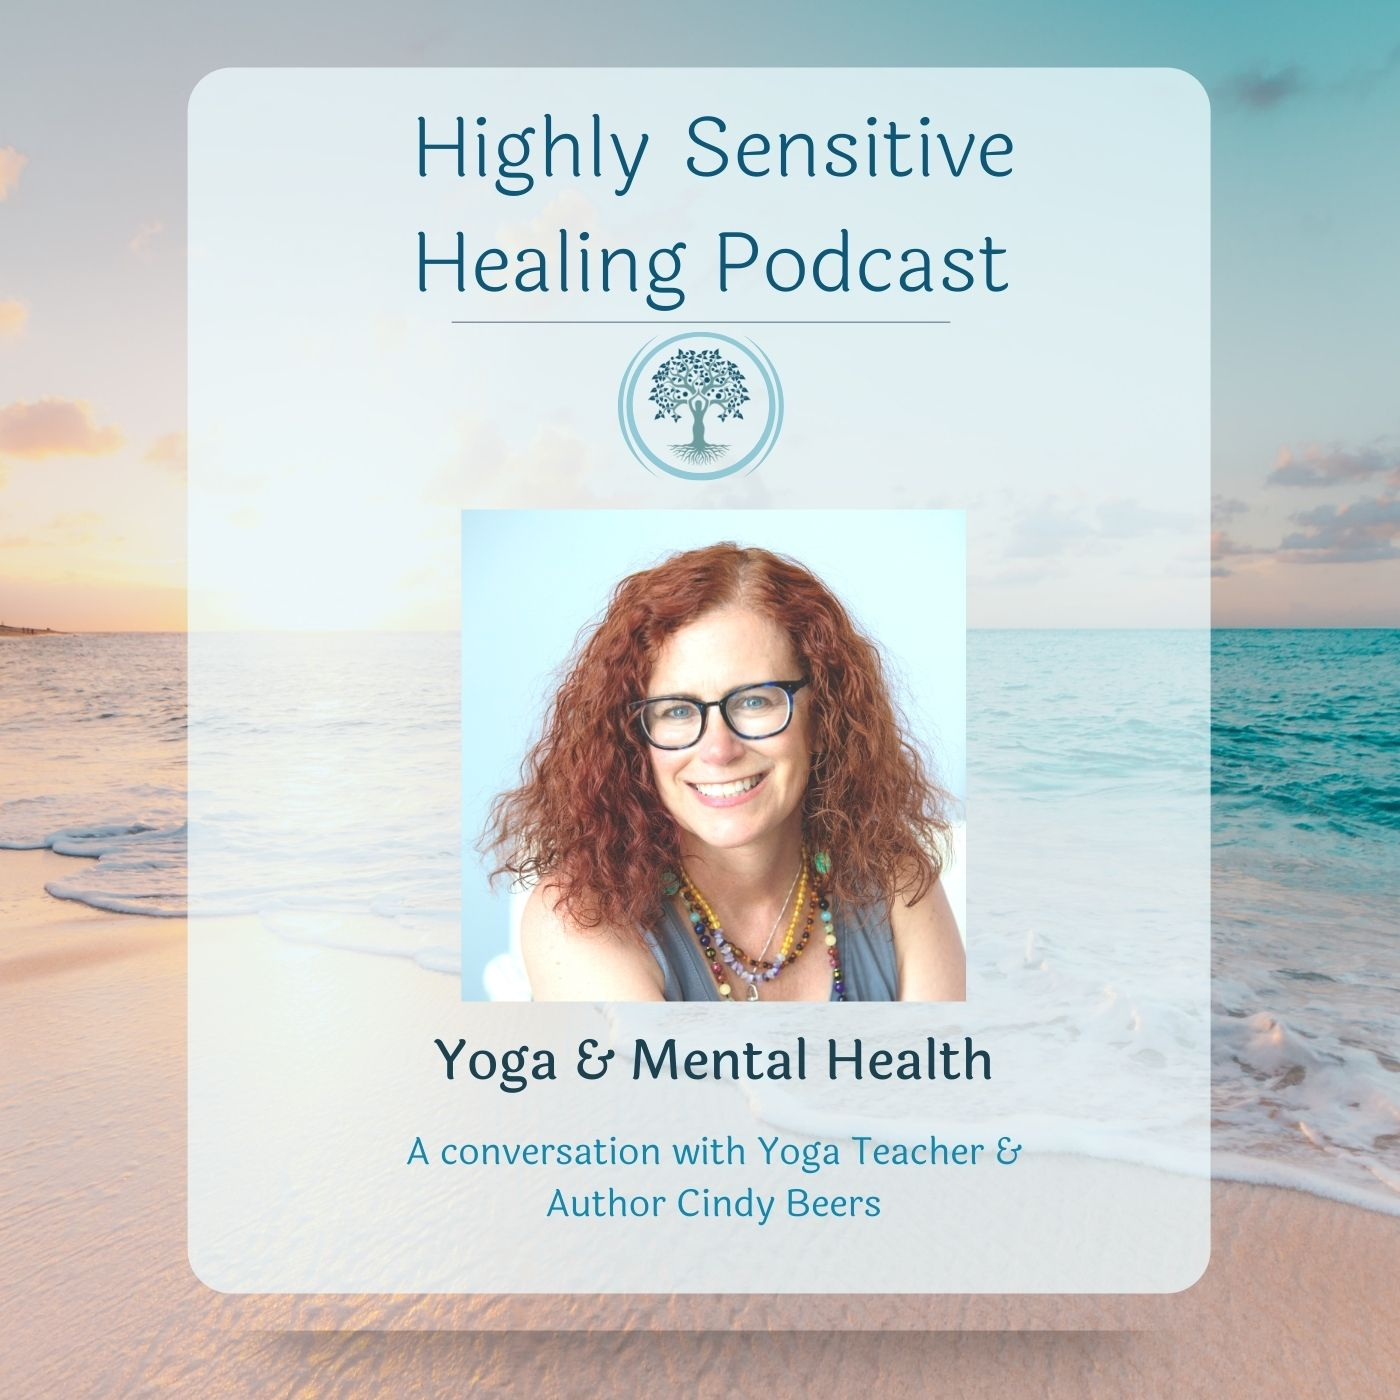 Artwork for podcast Highly Sensitive Healing